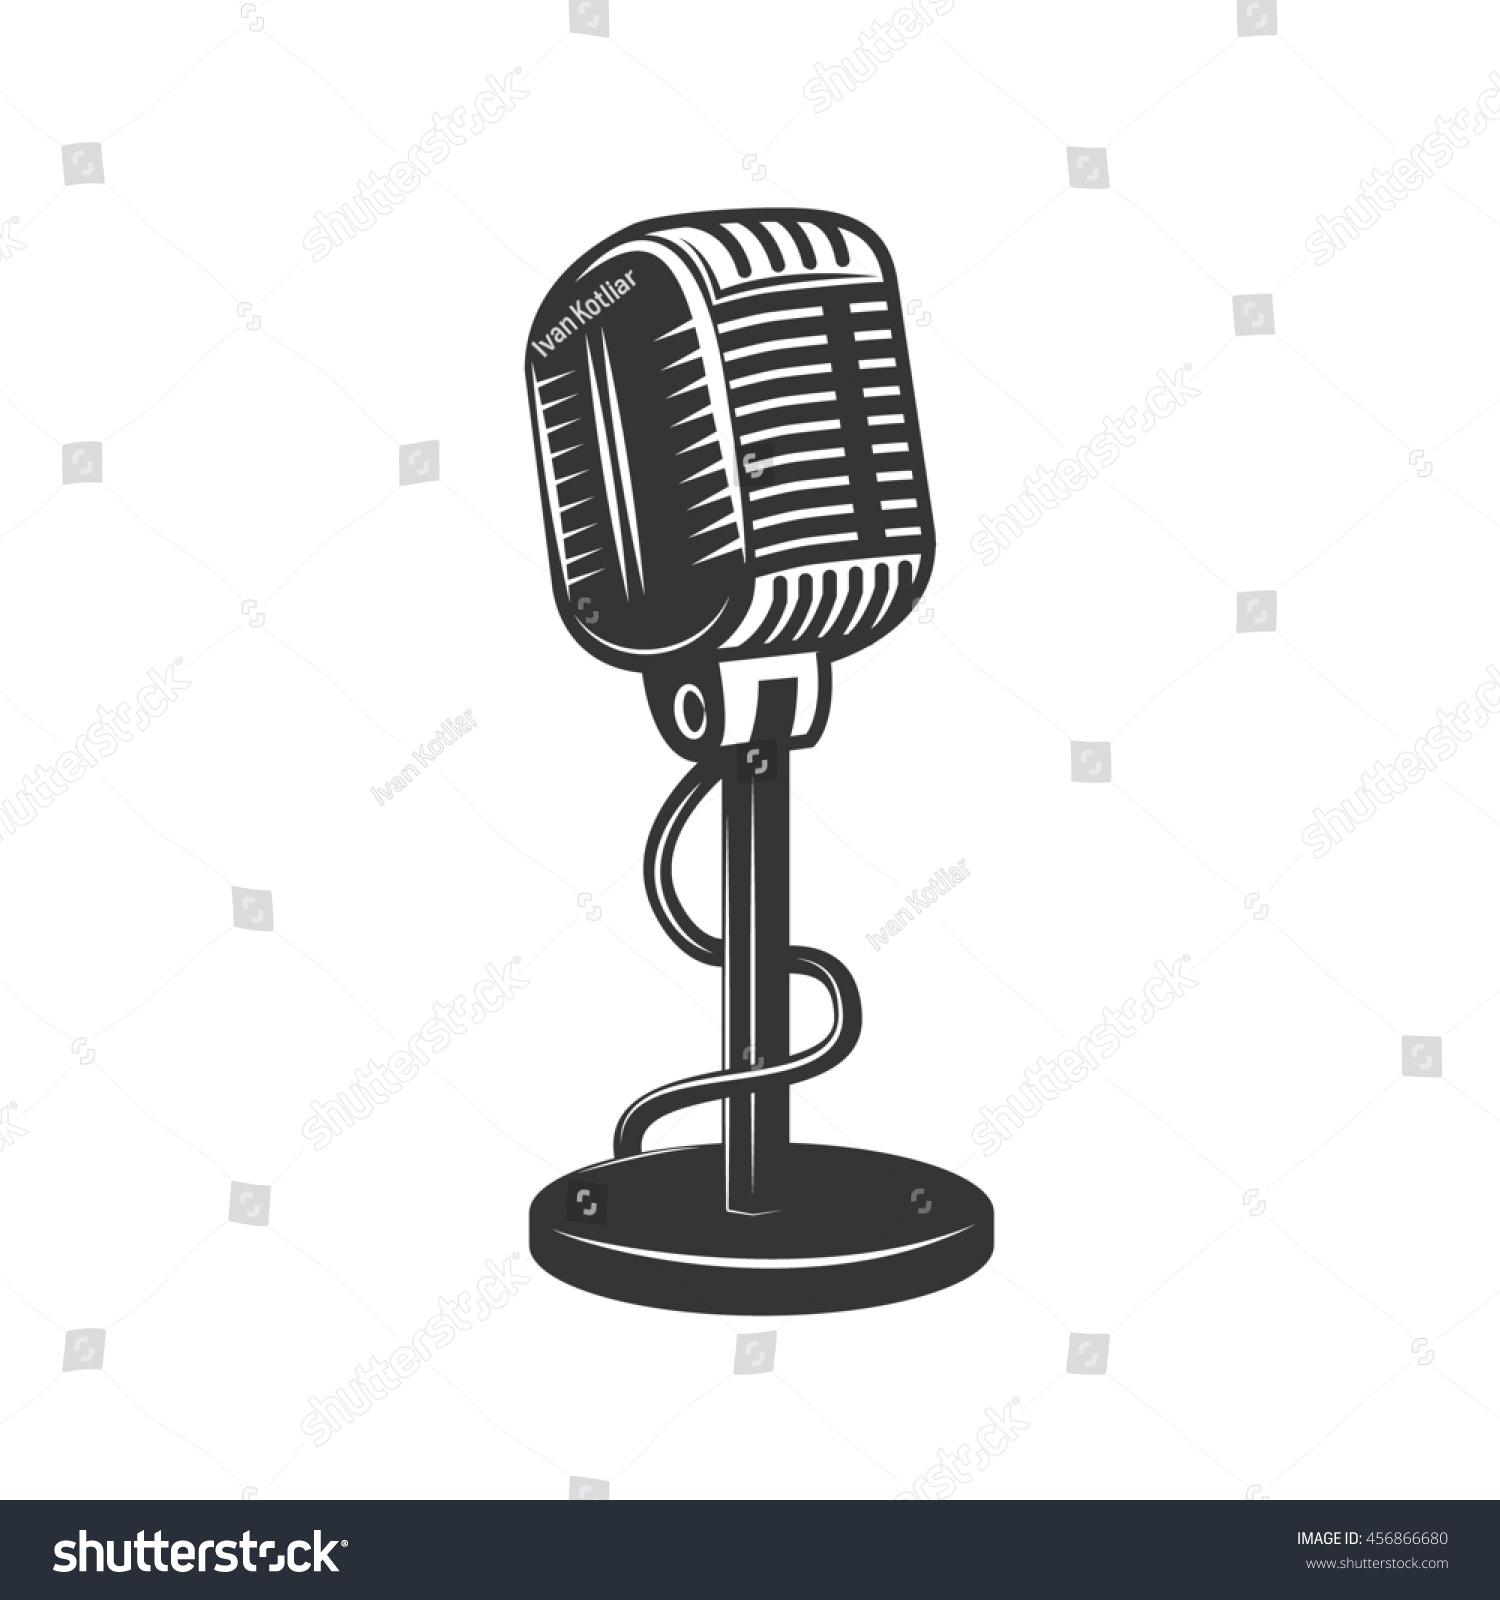 Royalty-free Retro monochrome microphone icon. Old… #456866680 Stock ...